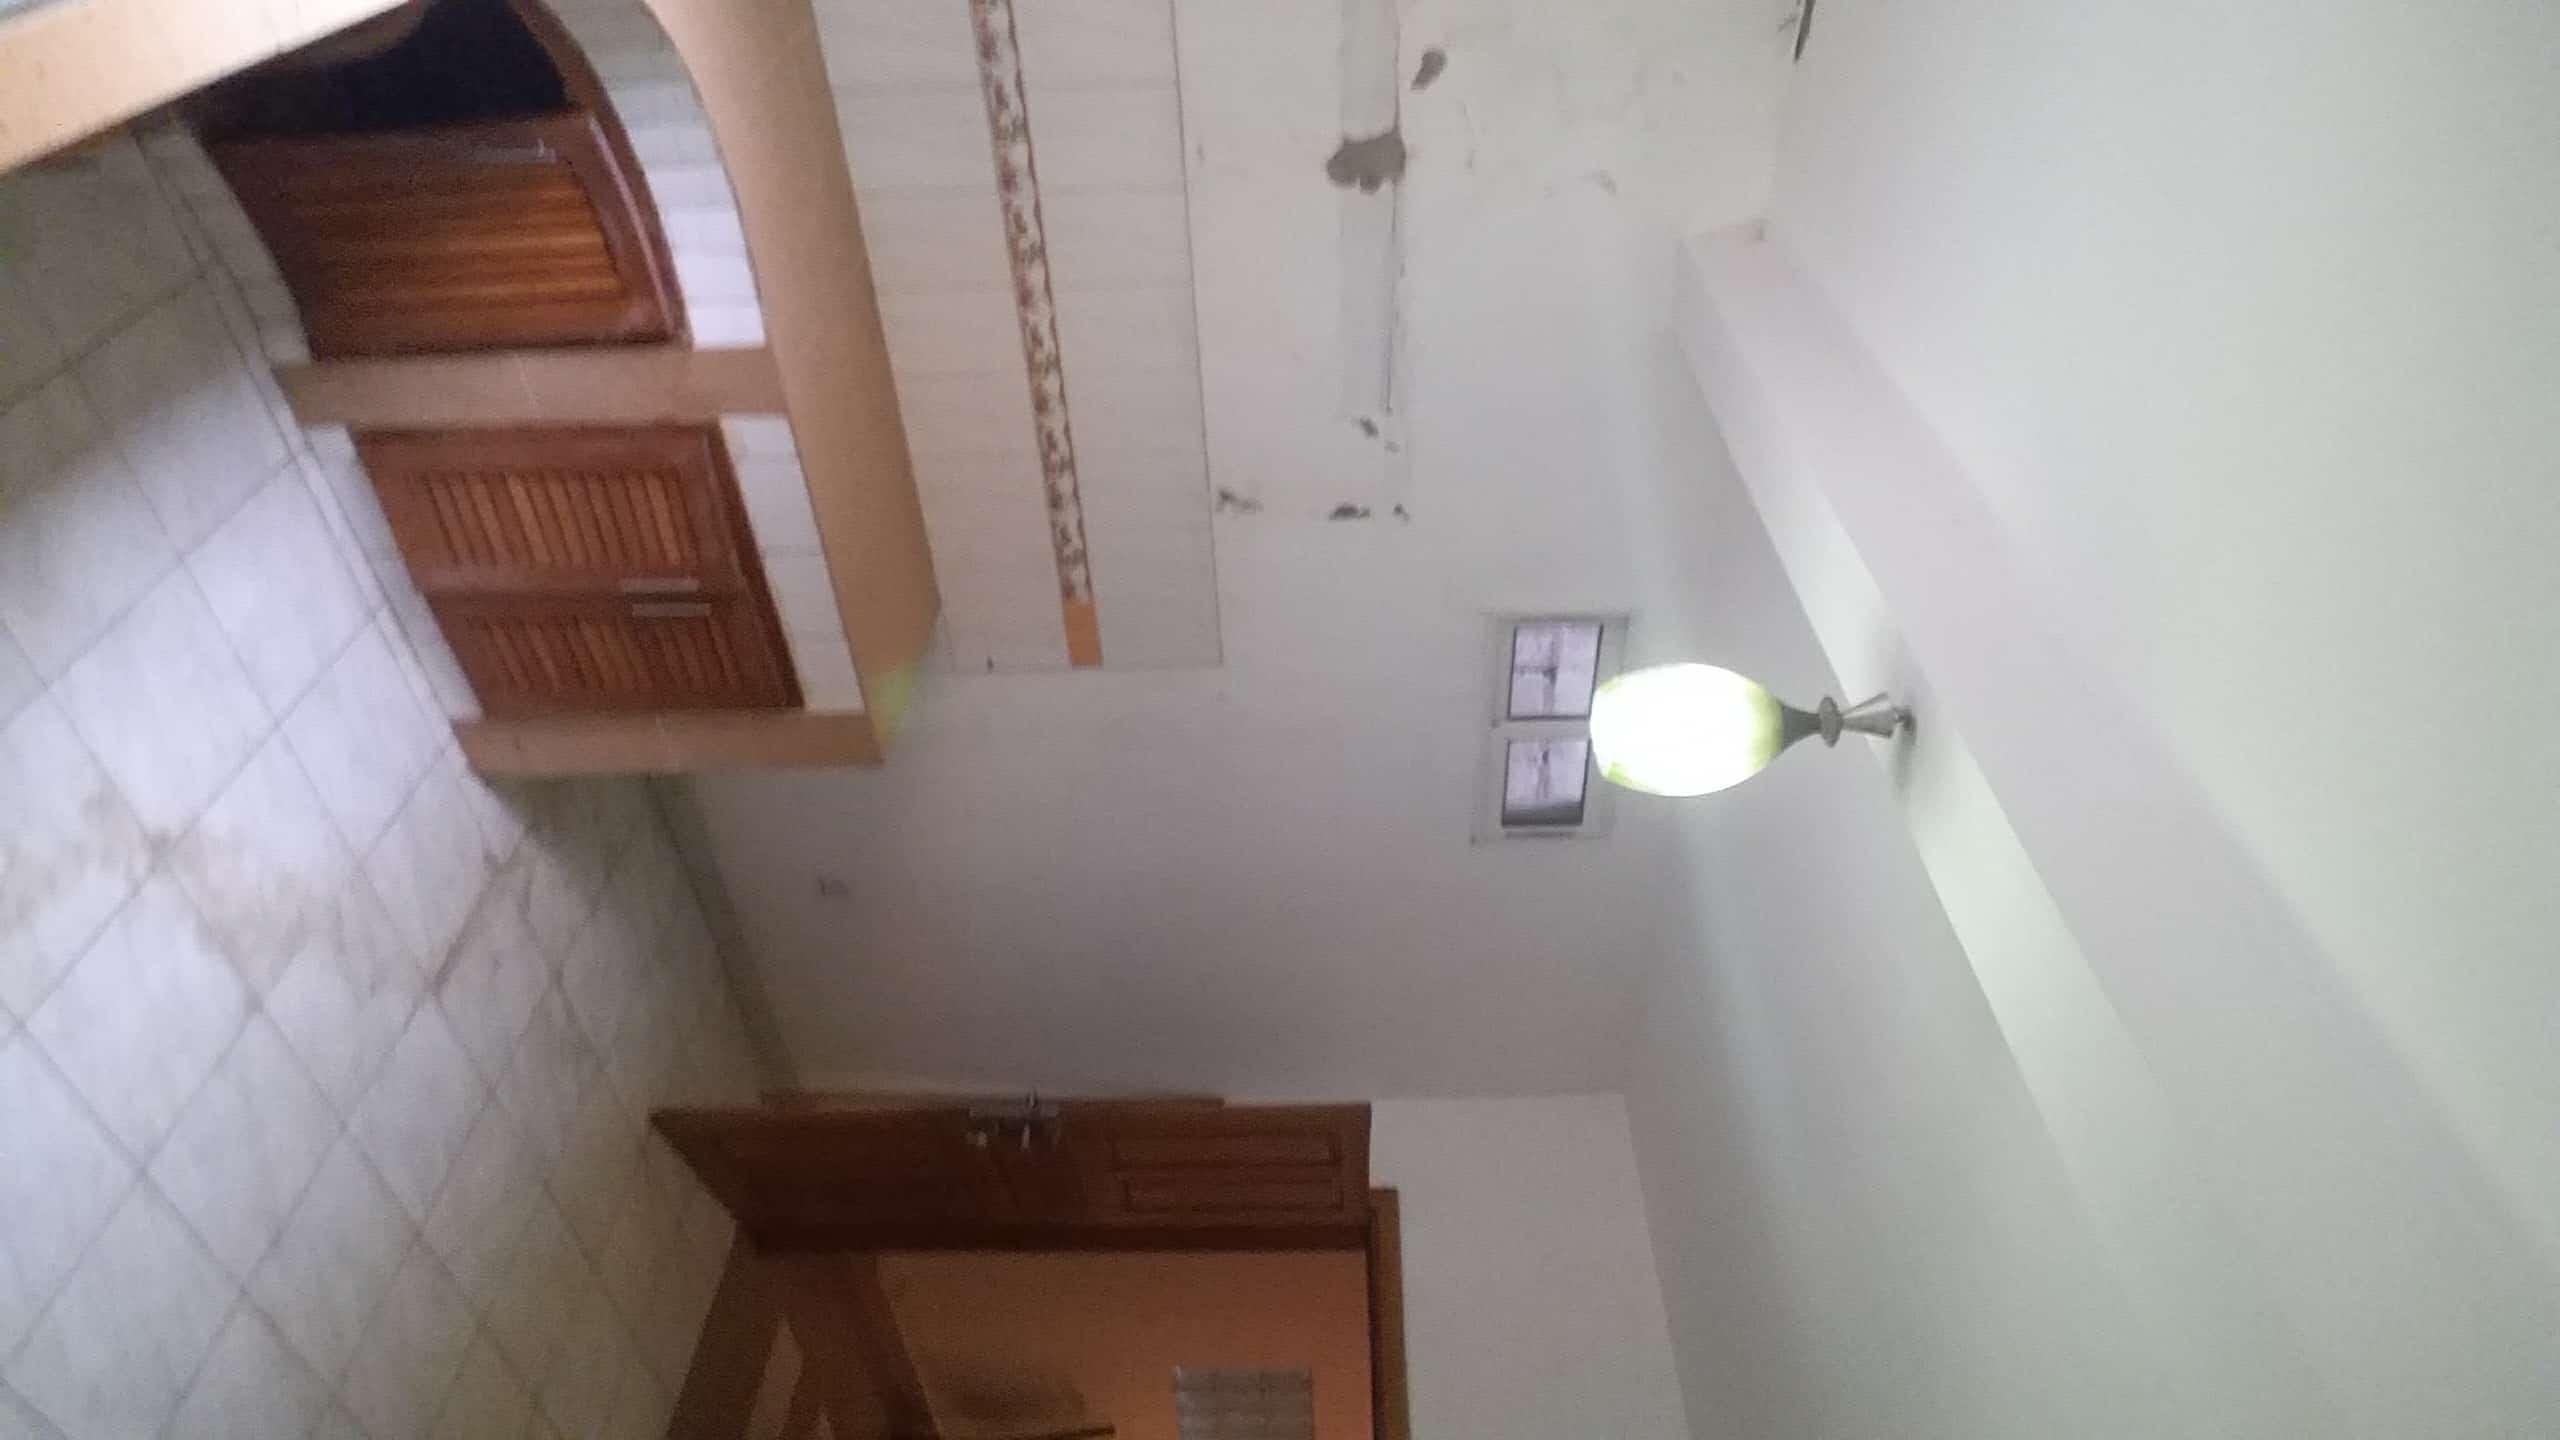 Apartment to rent - Yaoundé, Bastos, Golf présidence - 2 living room(s), 3 bedroom(s), 3 bathroom(s) - 350 000 FCFA / month